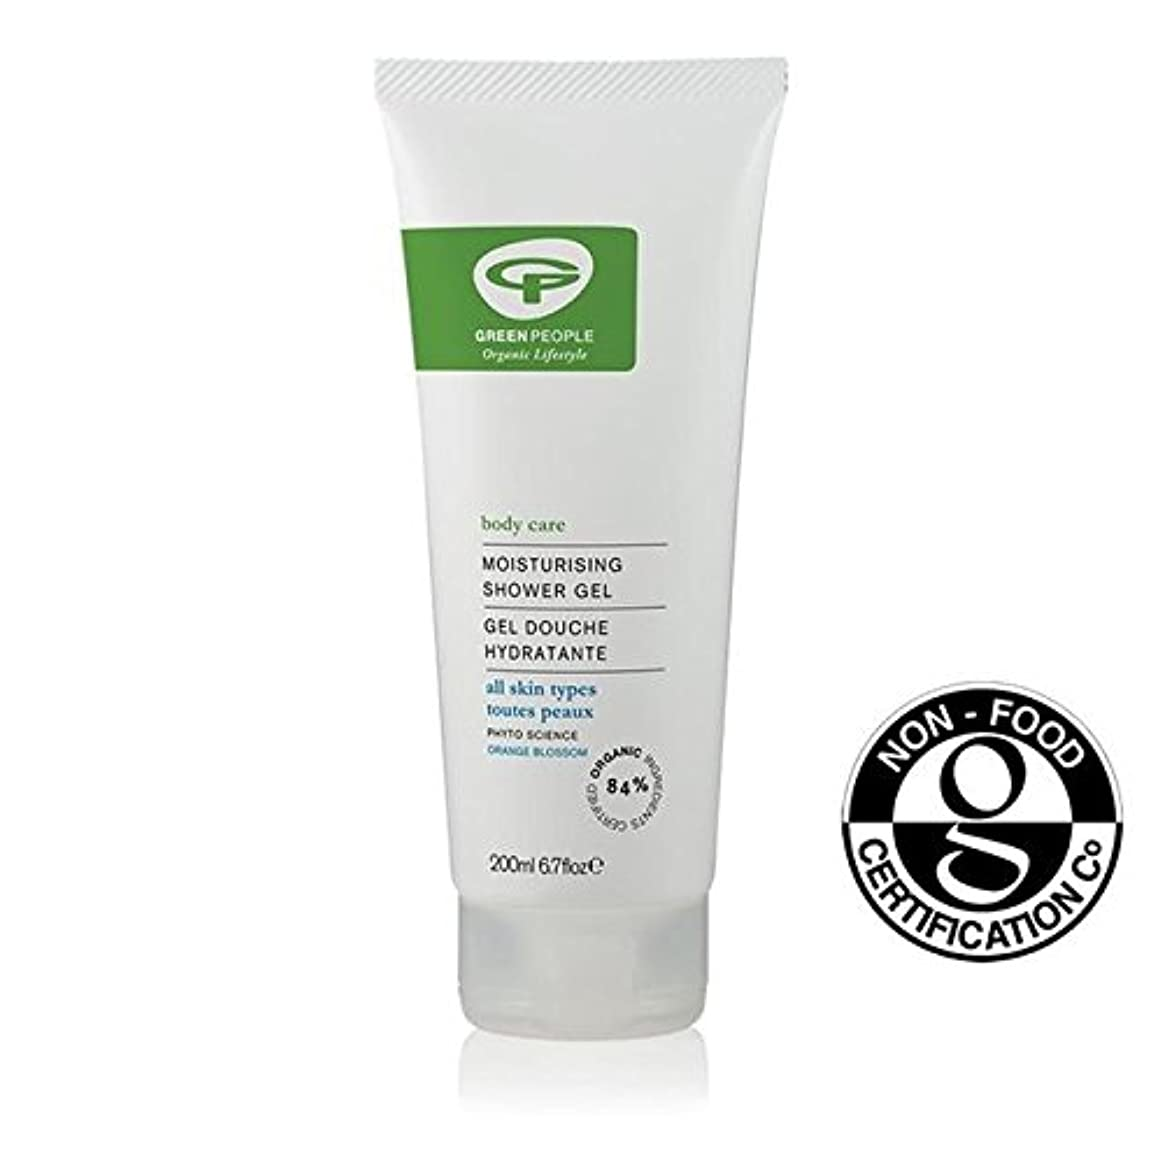 Green People Organic Moisturising Shower Gel 200ml - 緑の人々の有機保湿シャワージェル200 [並行輸入品]